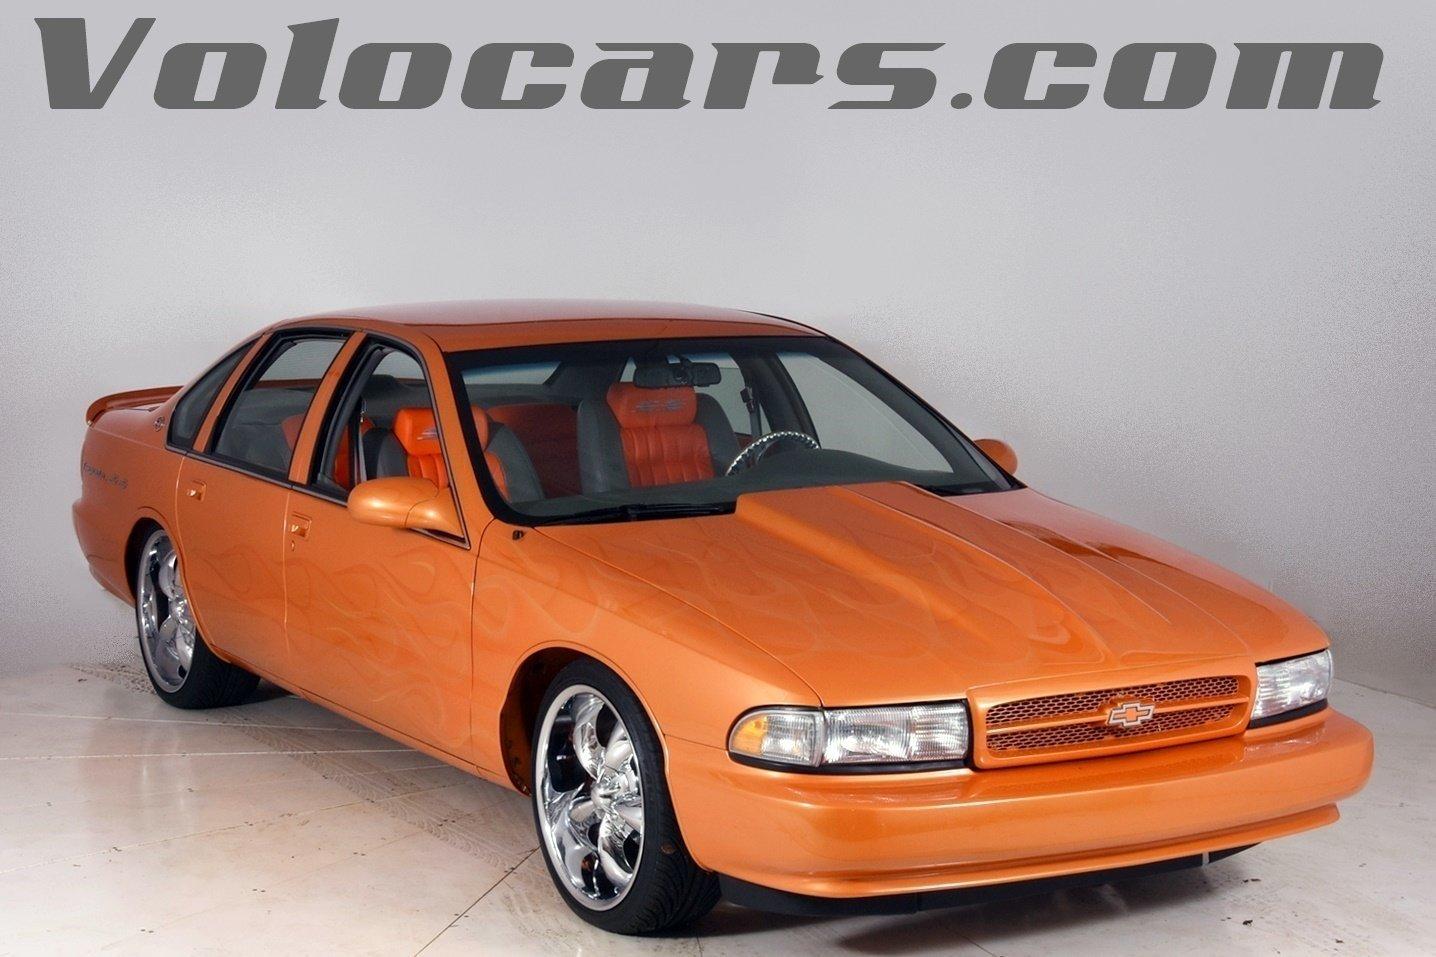 37916634cec2e2c234 hd 1995 chevrolet impala ss